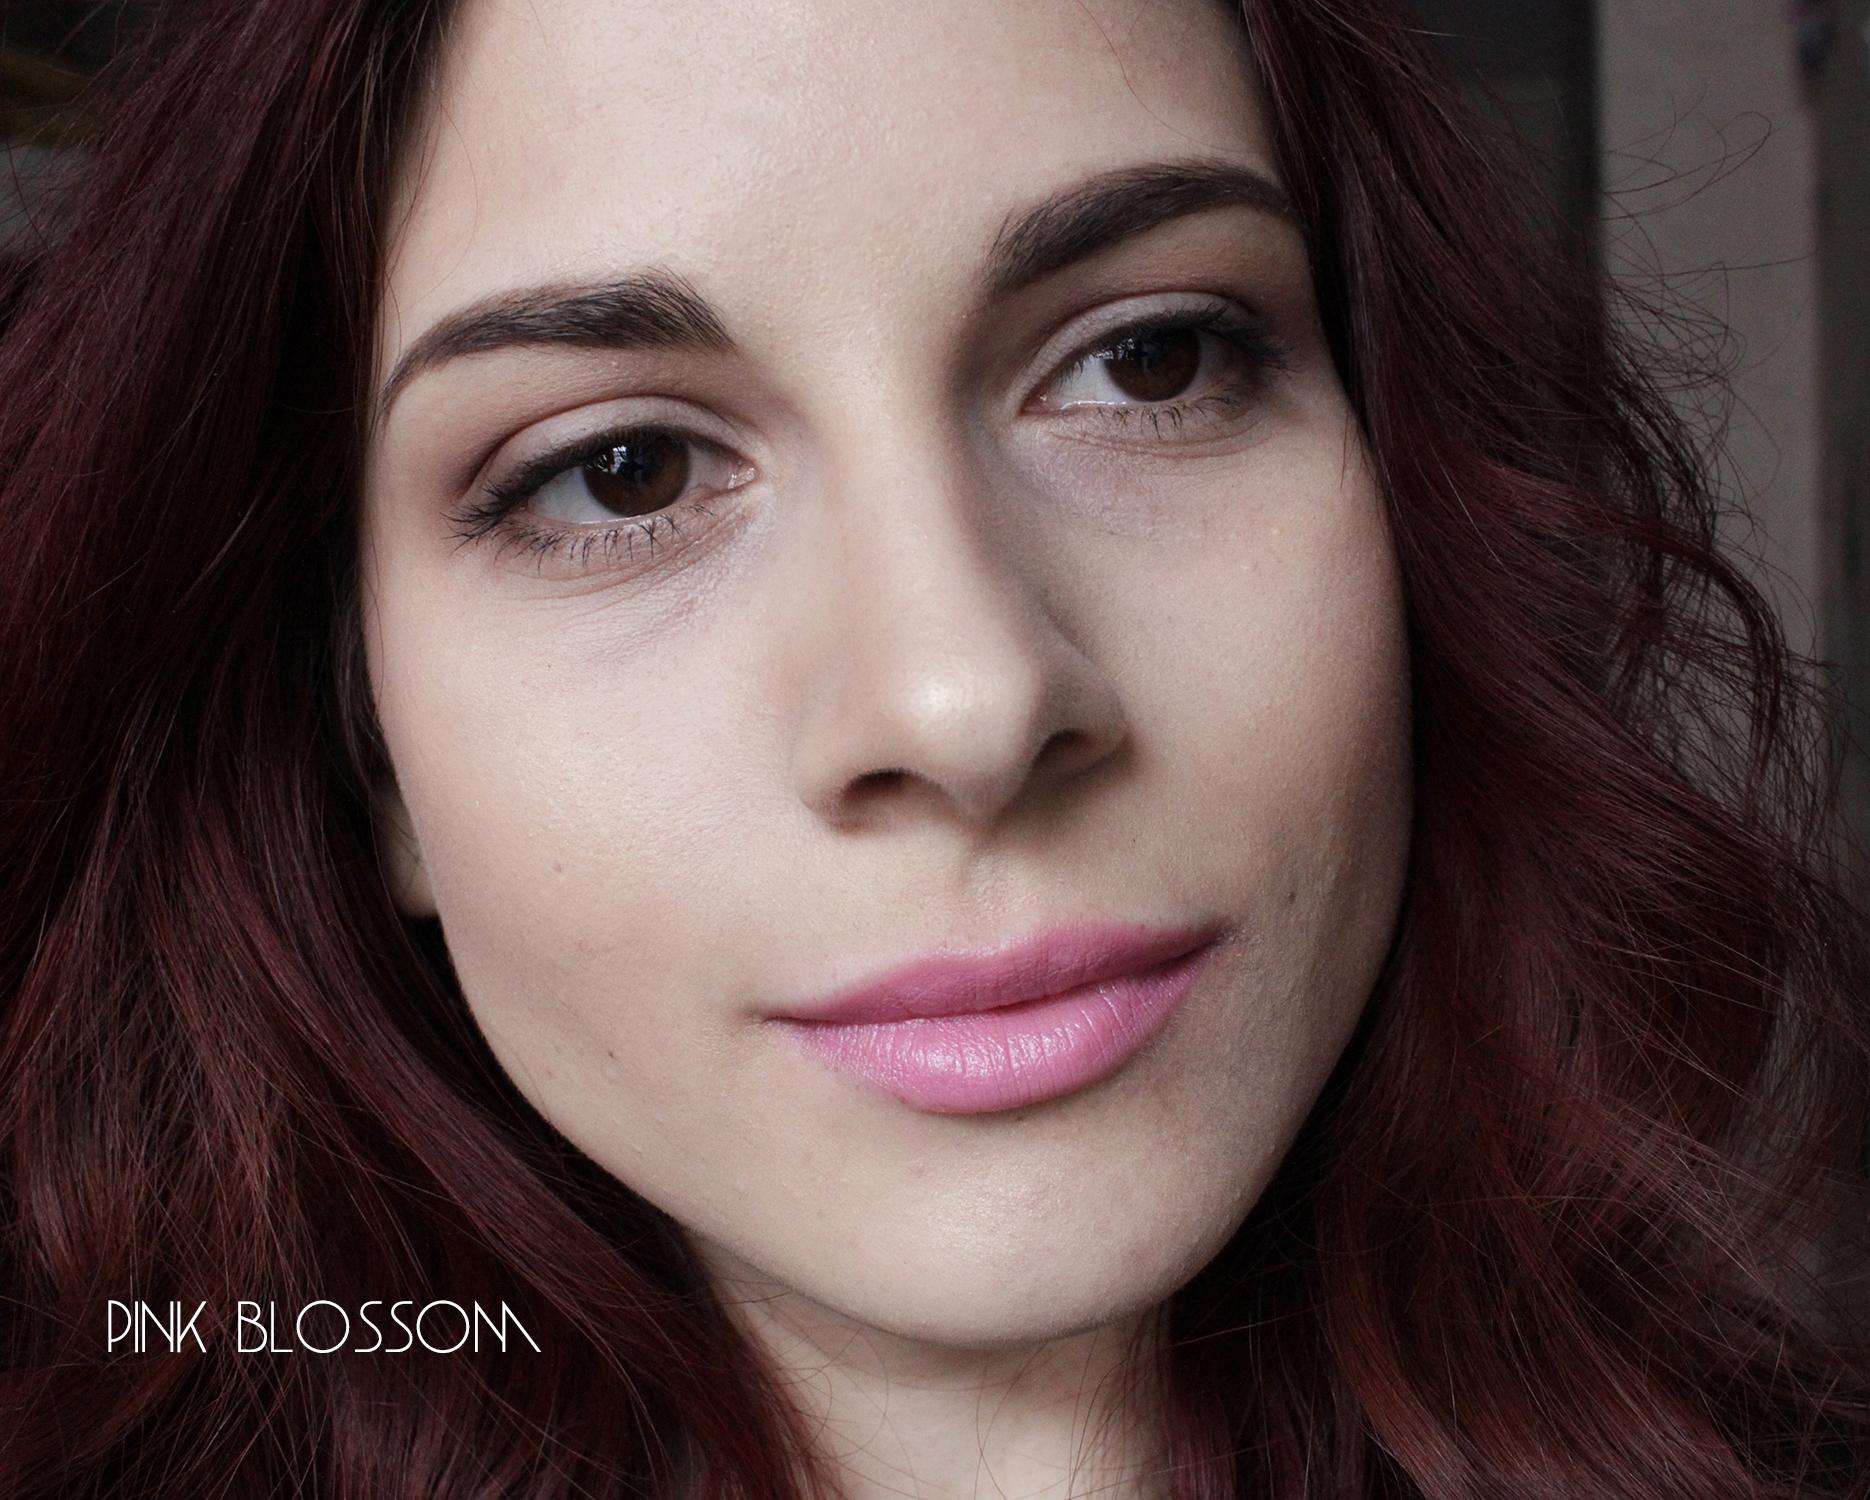 Avon Hidrokolor Indulgence Pink Blossom